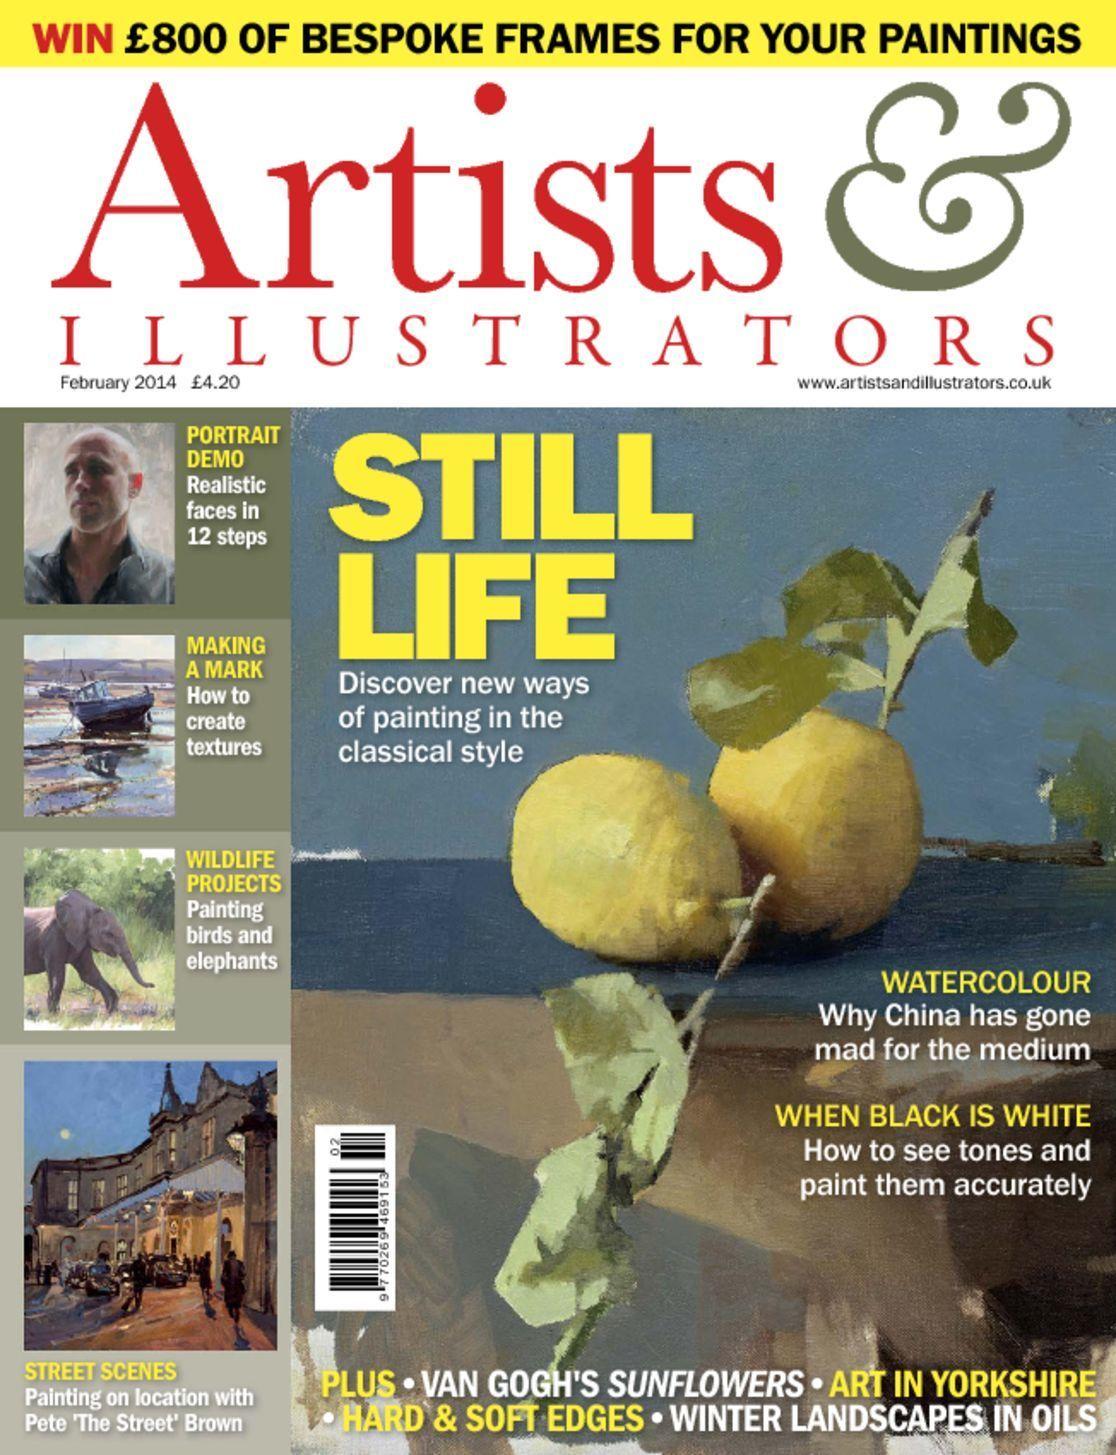 February 01, 2014 issue of Artists & Illustrators